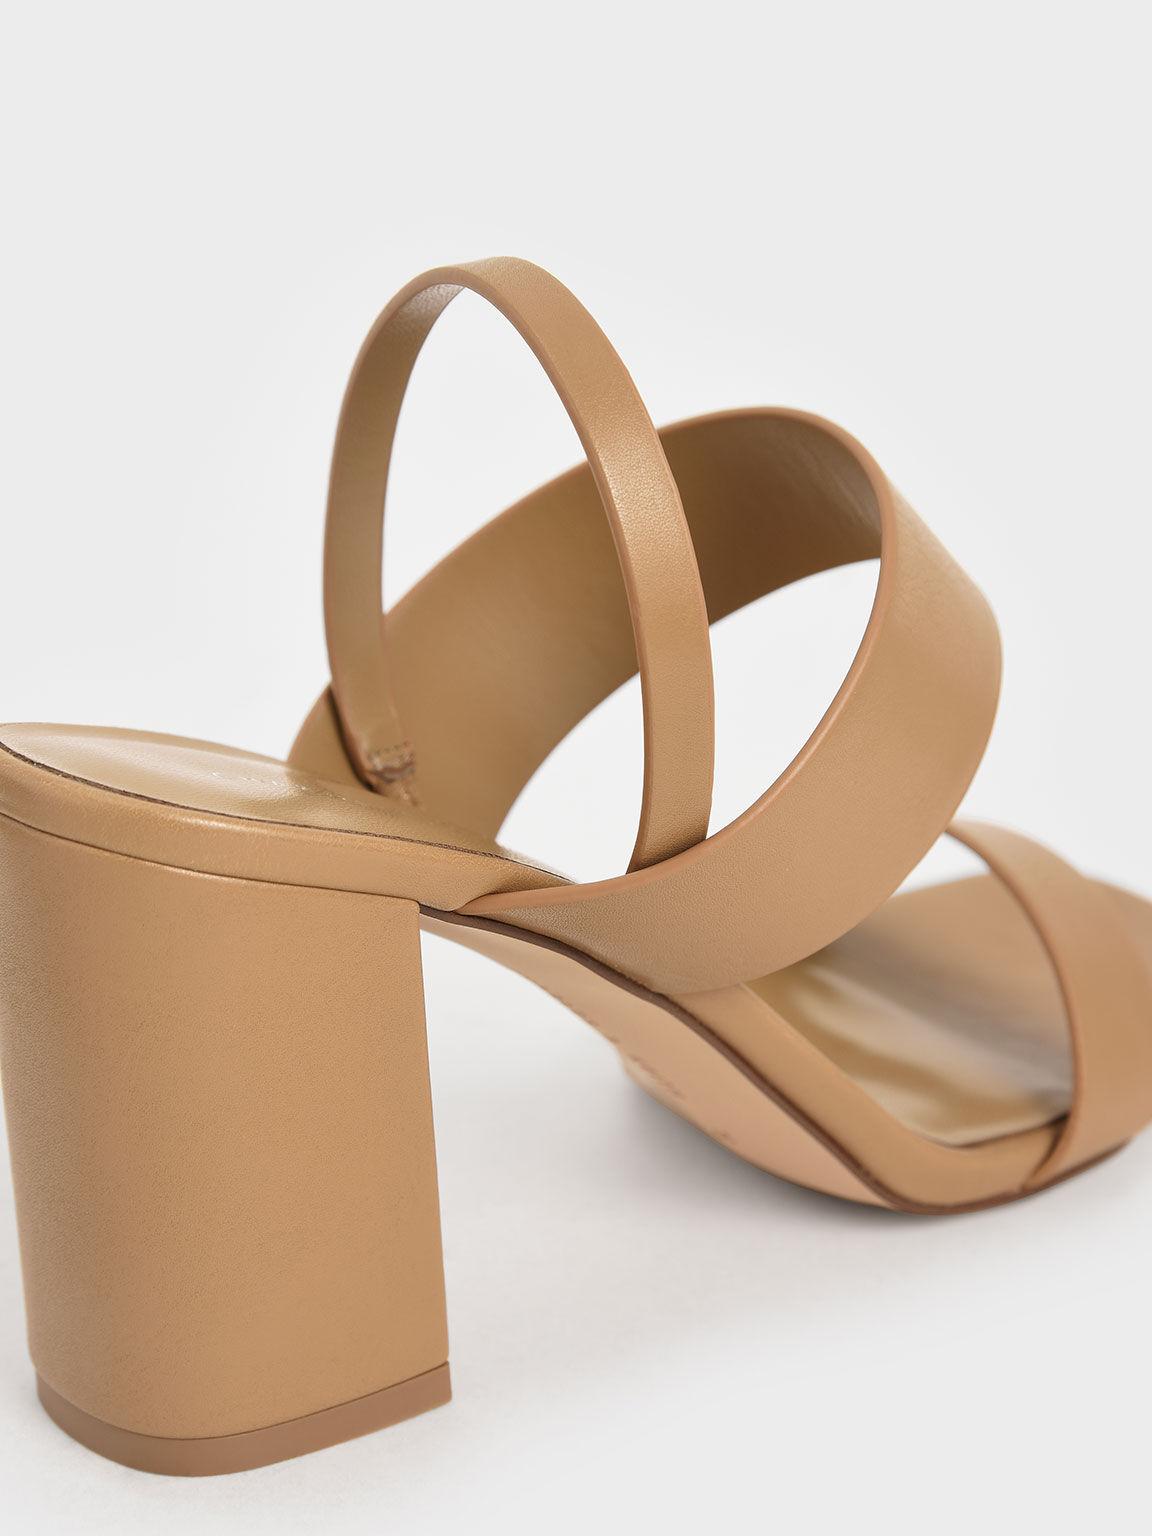 Back Strap Block Heel Sandals, Camel, hi-res